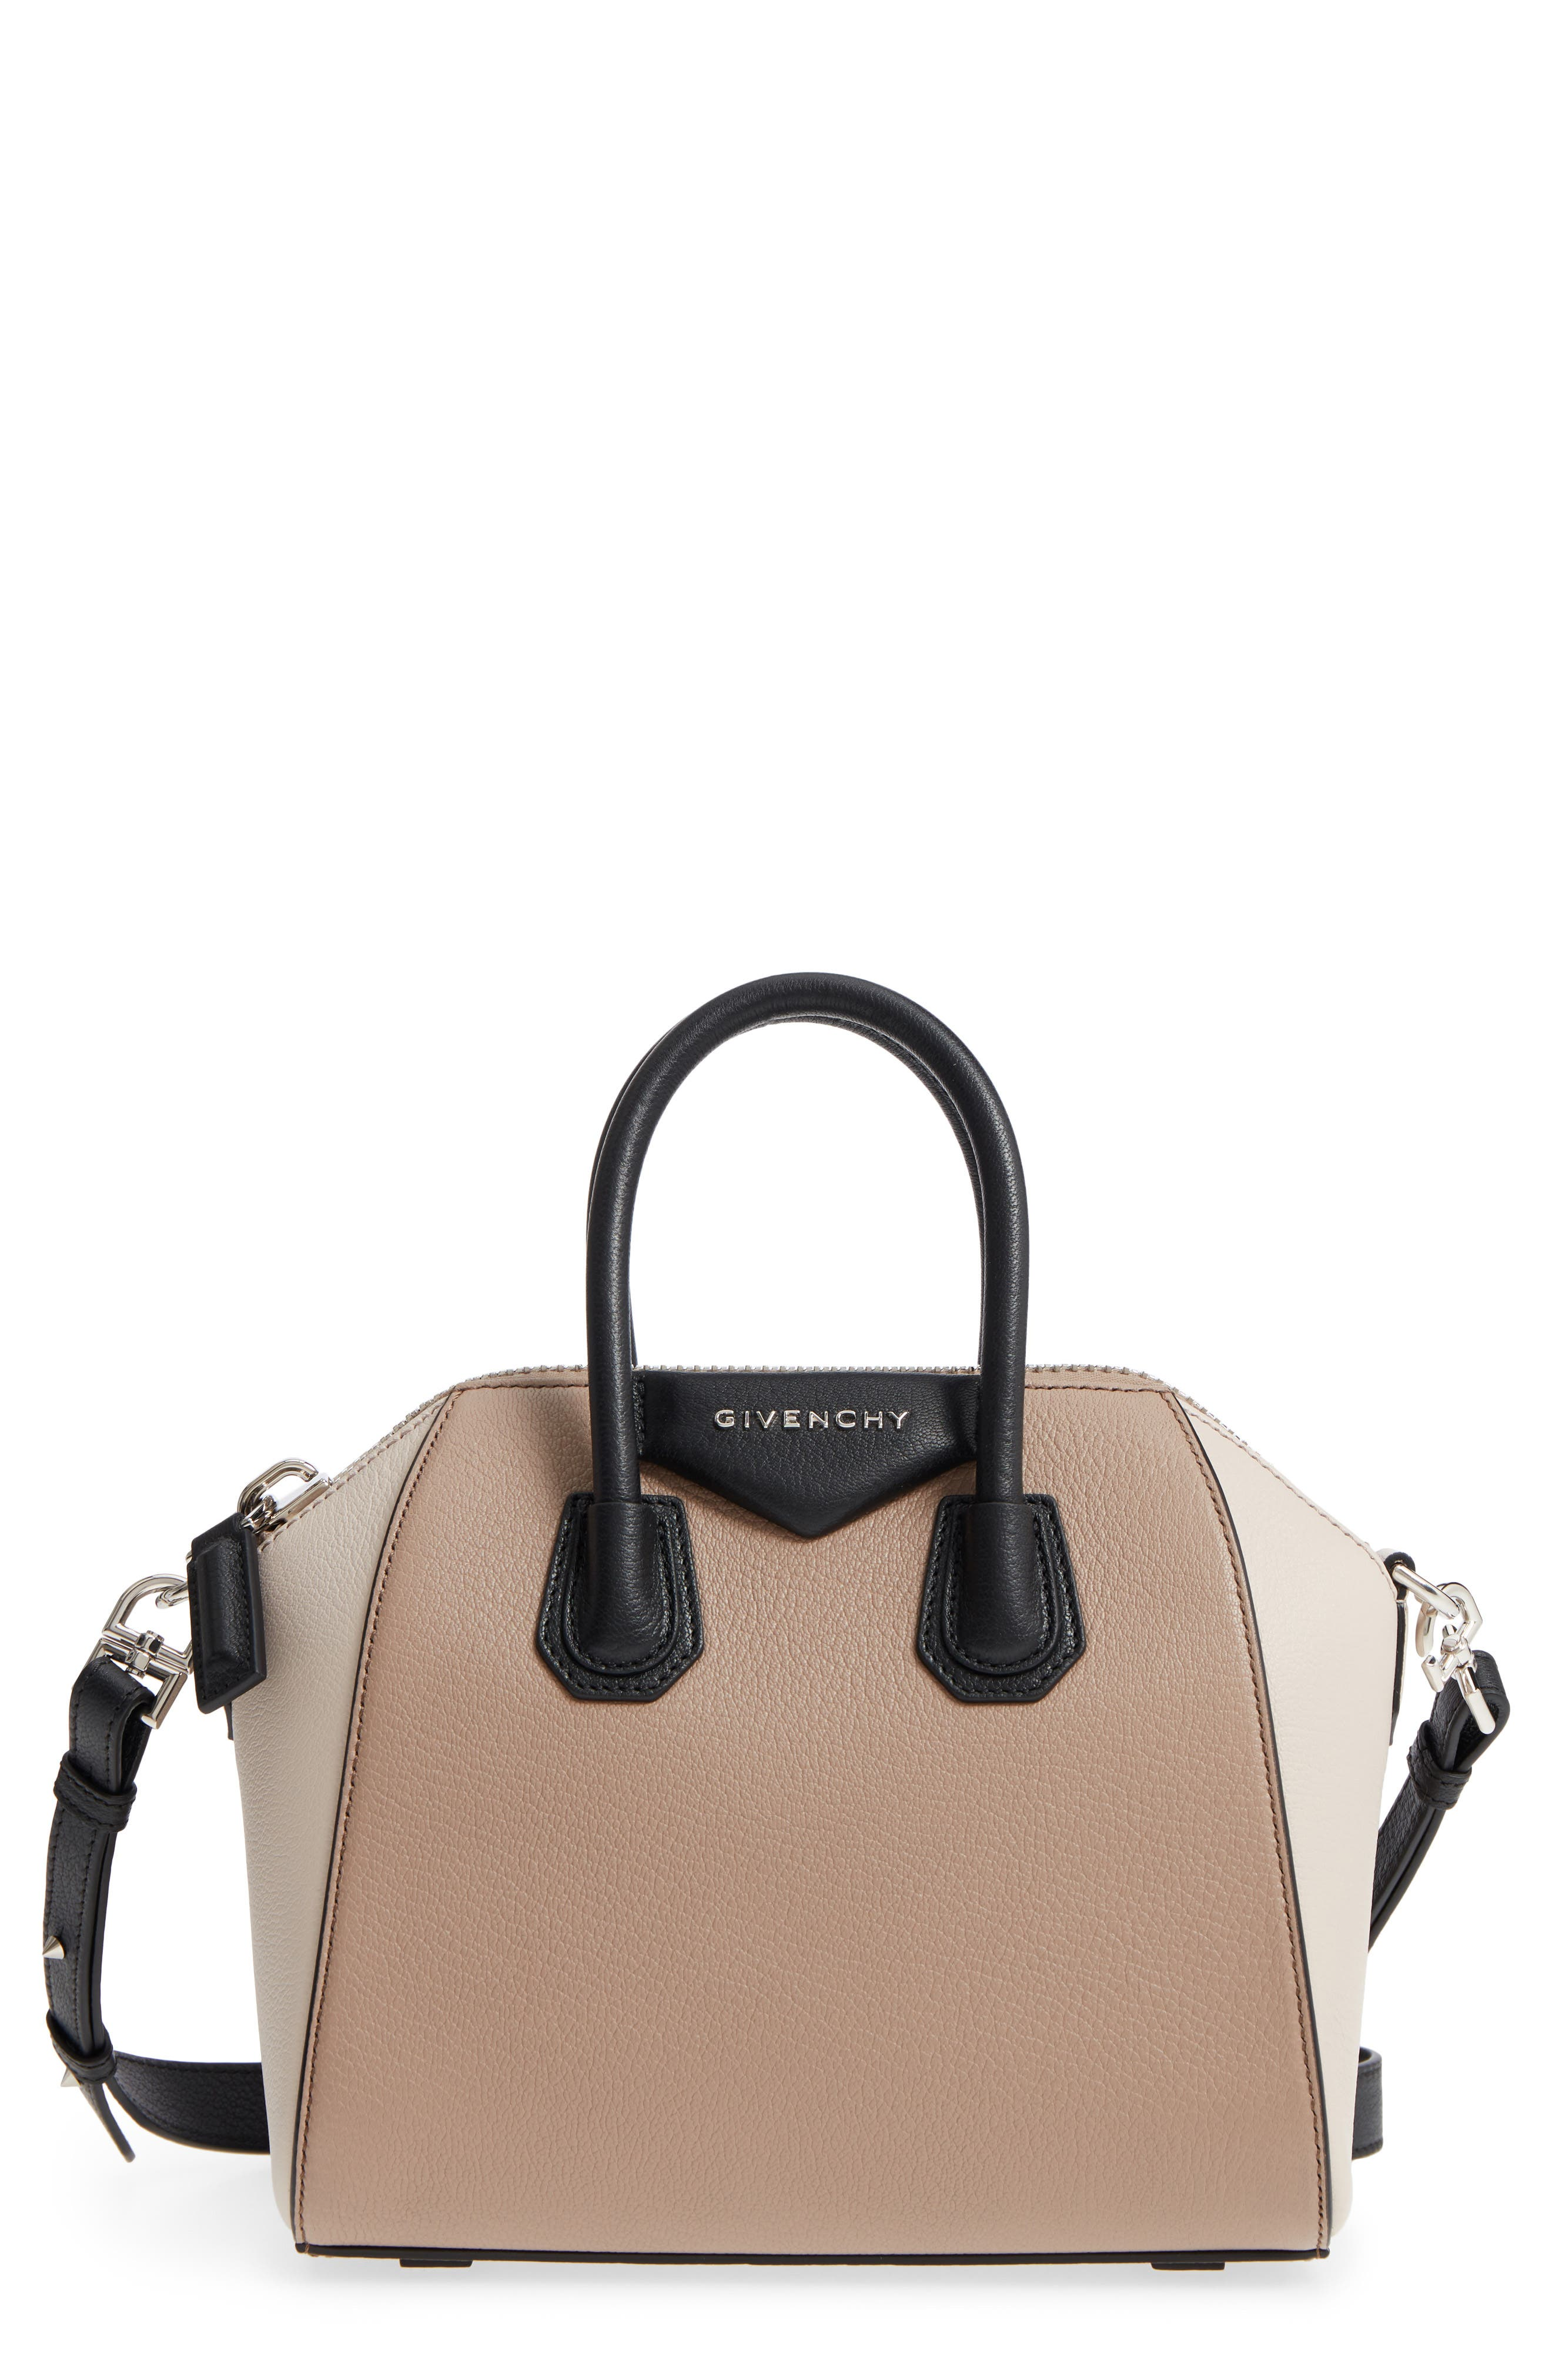 Givenchy Mini Antigona Tricolor Sugar Leather Satchel